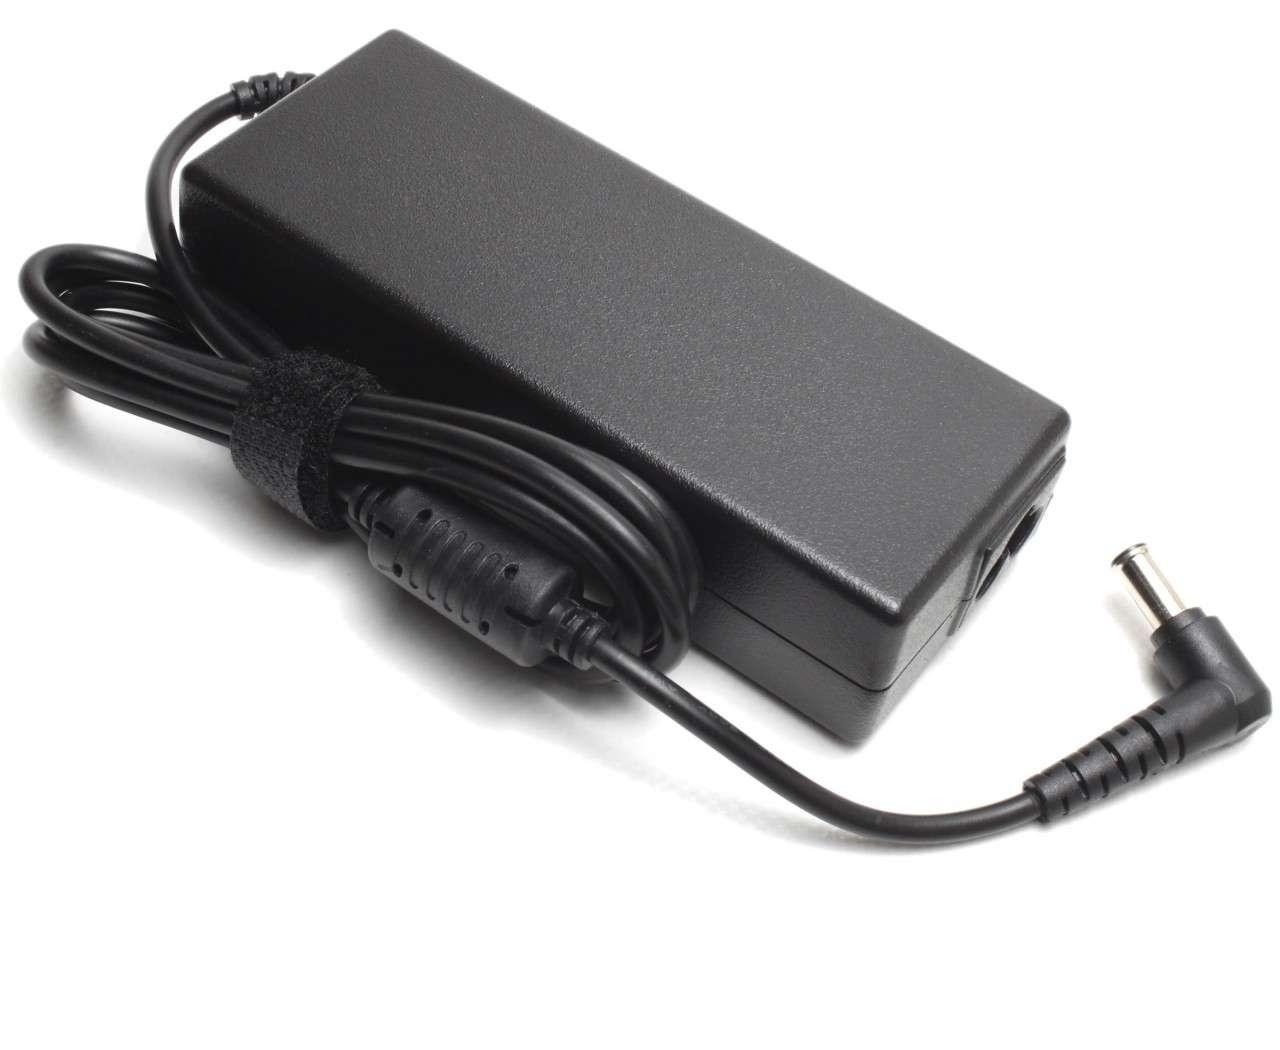 Incarcator Sony Vaio VGN SR11 Replacement imagine powerlaptop.ro 2021